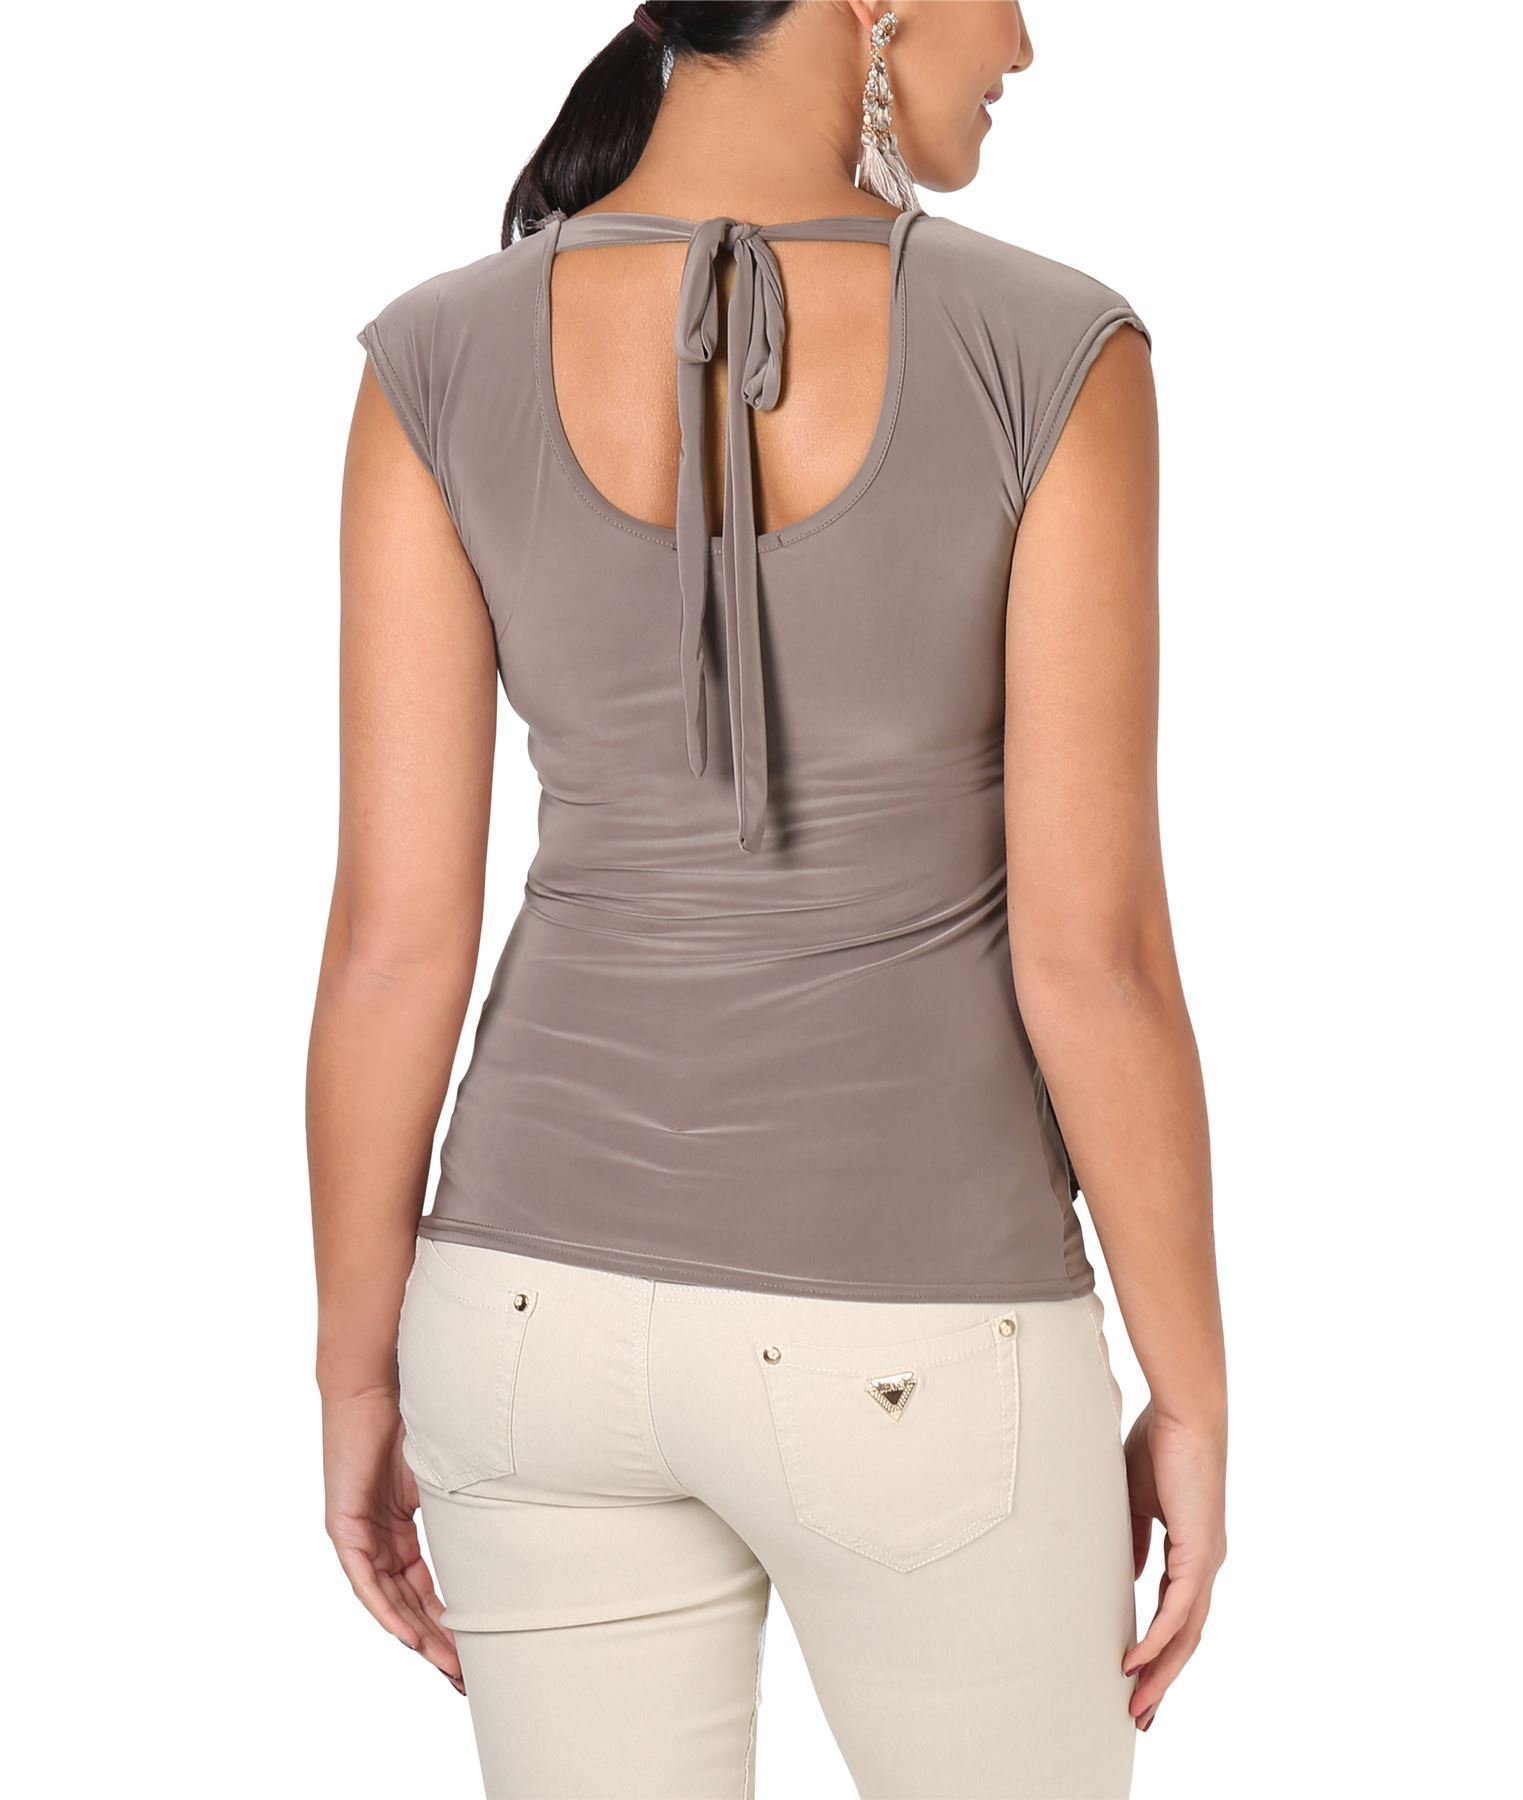 Femme-Top-Haut-Soiree-Decollete-N-ud-Dos-Chic-Sexy-Mode-Grande-Taille-Debardeur miniature 12